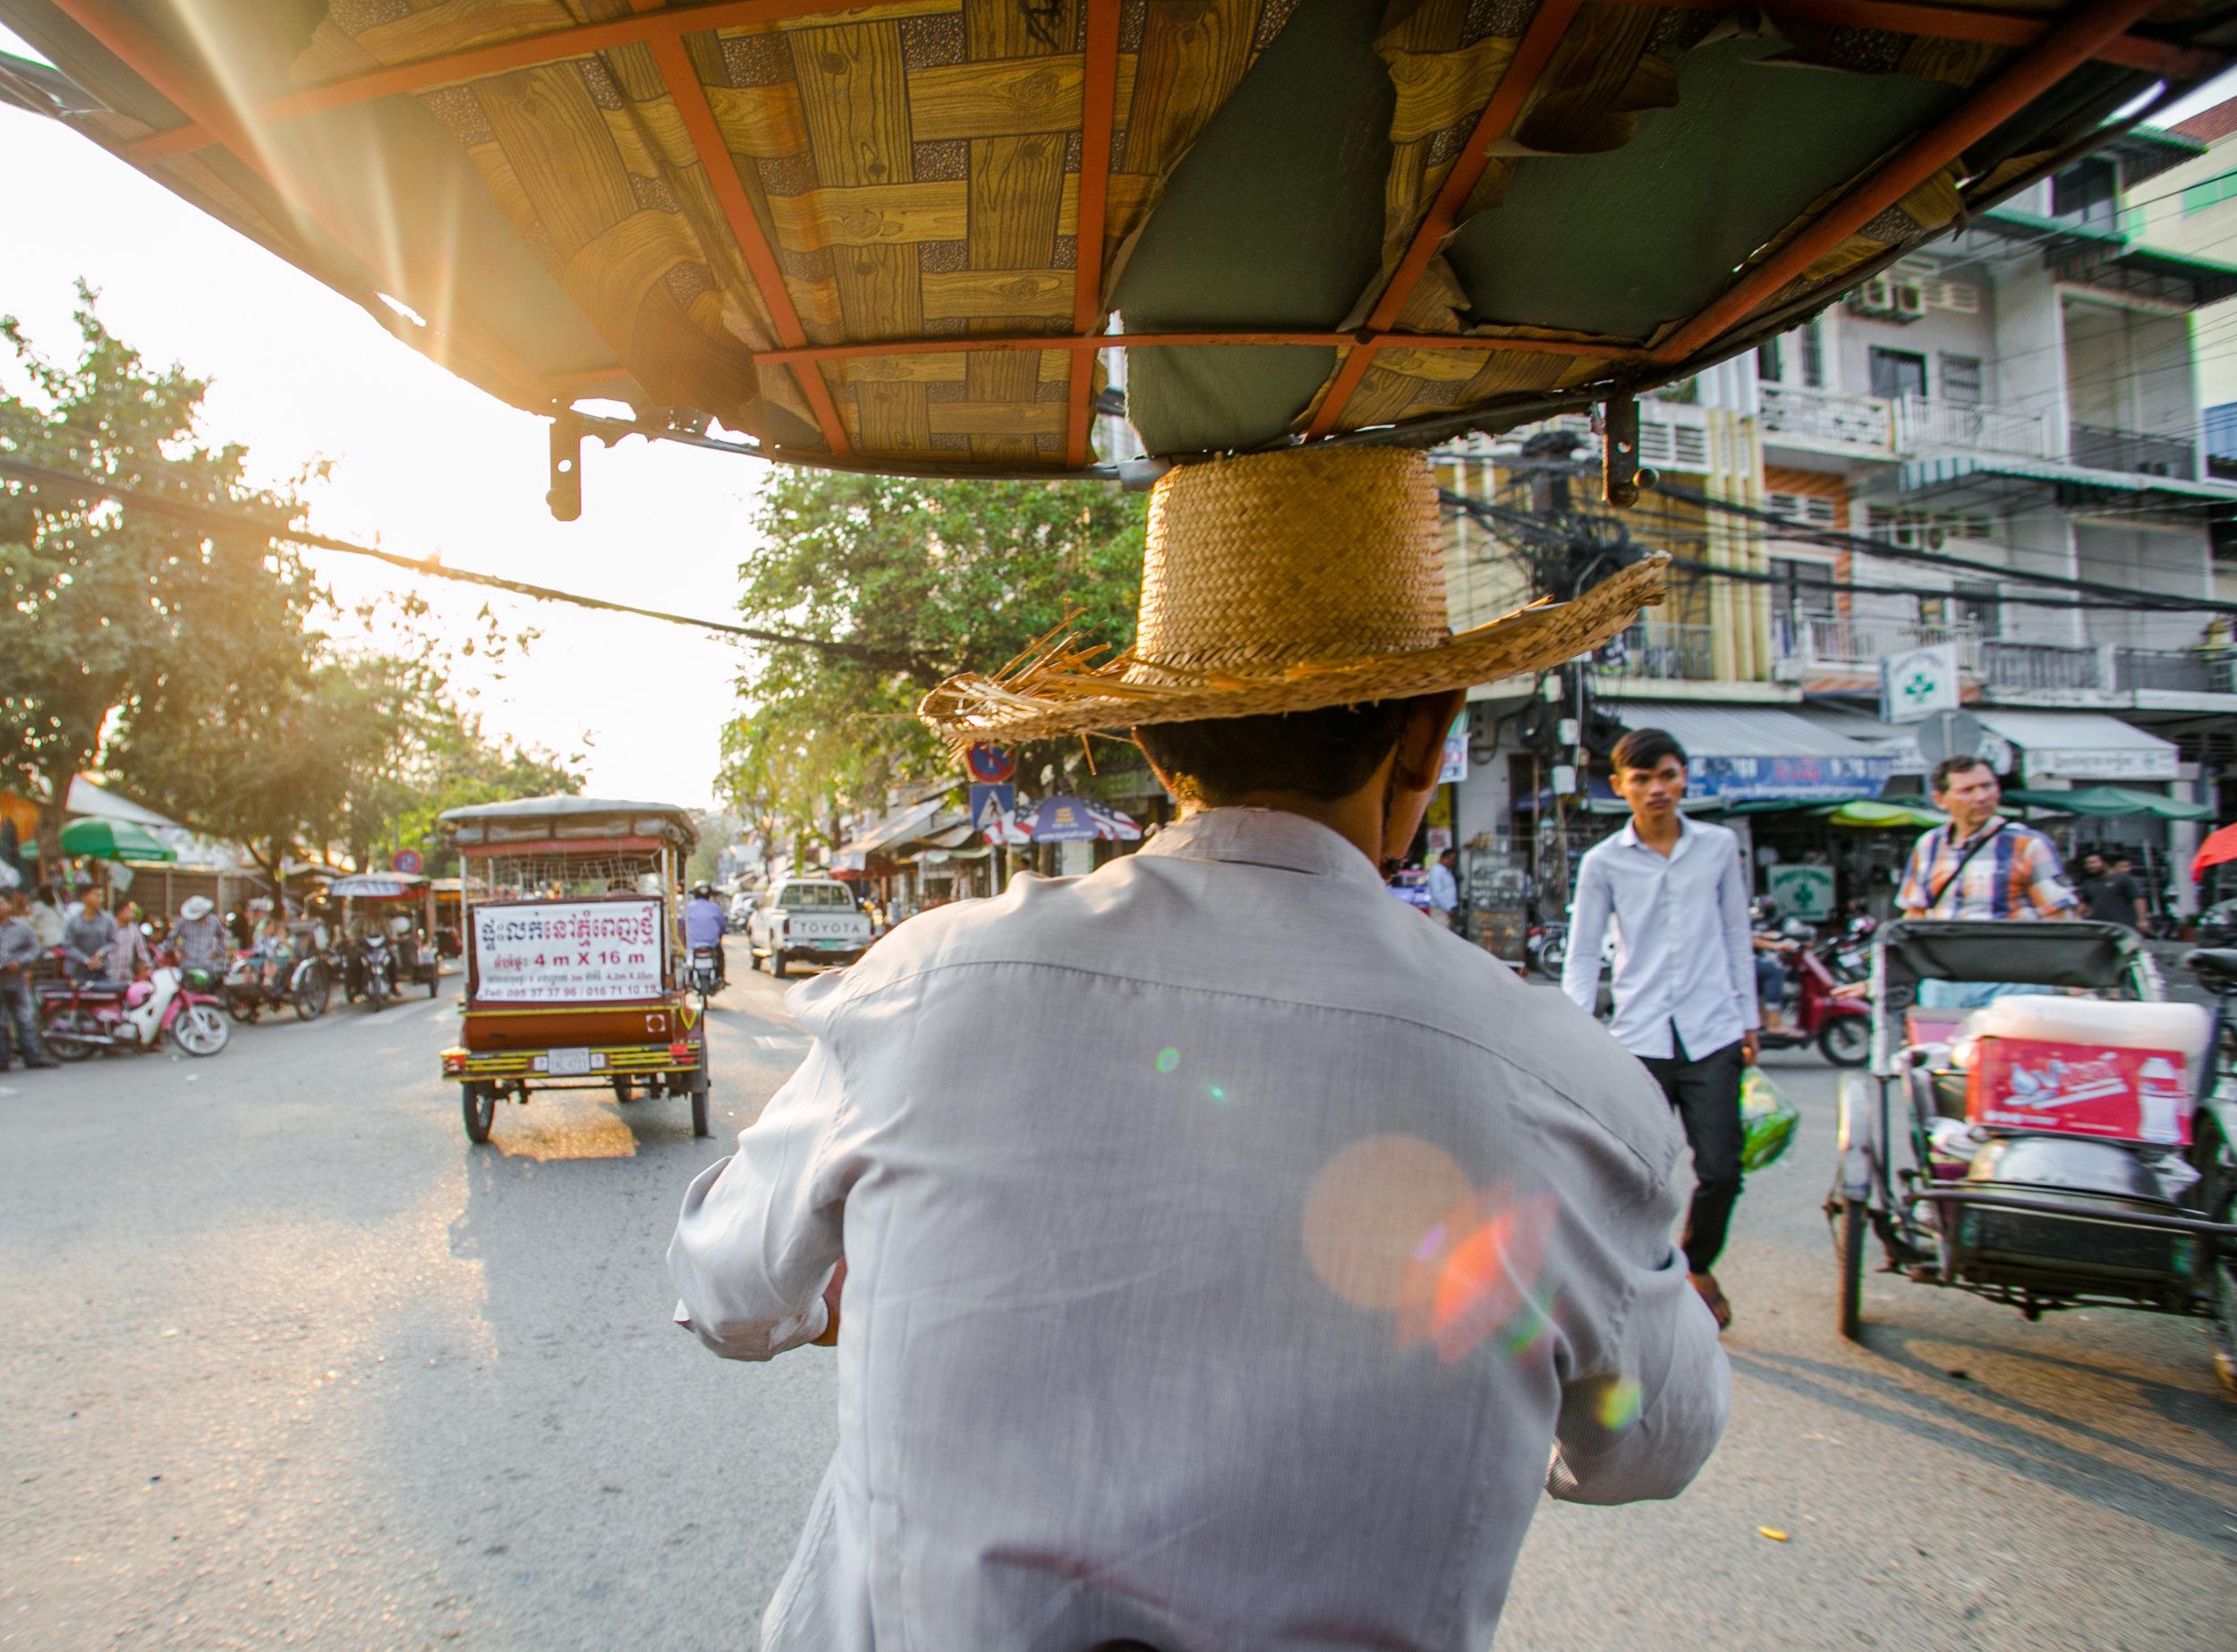 Tuk Tuk driver - Phnom Penh, Cambodia.